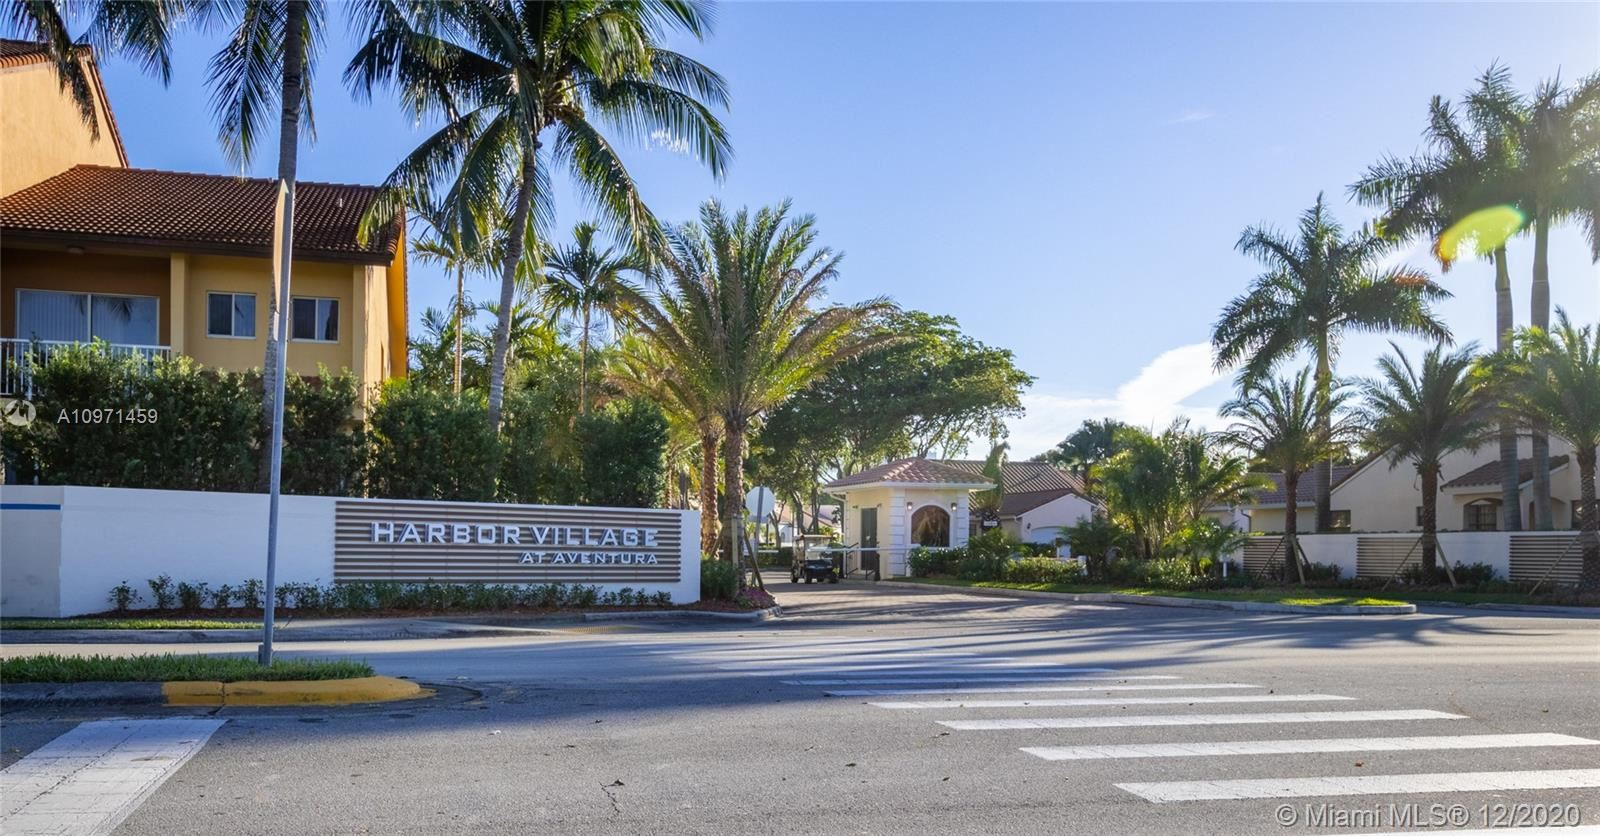 21385 Marina Cove Cir #12-E, Aventura, FL 33180 - #: A10971459